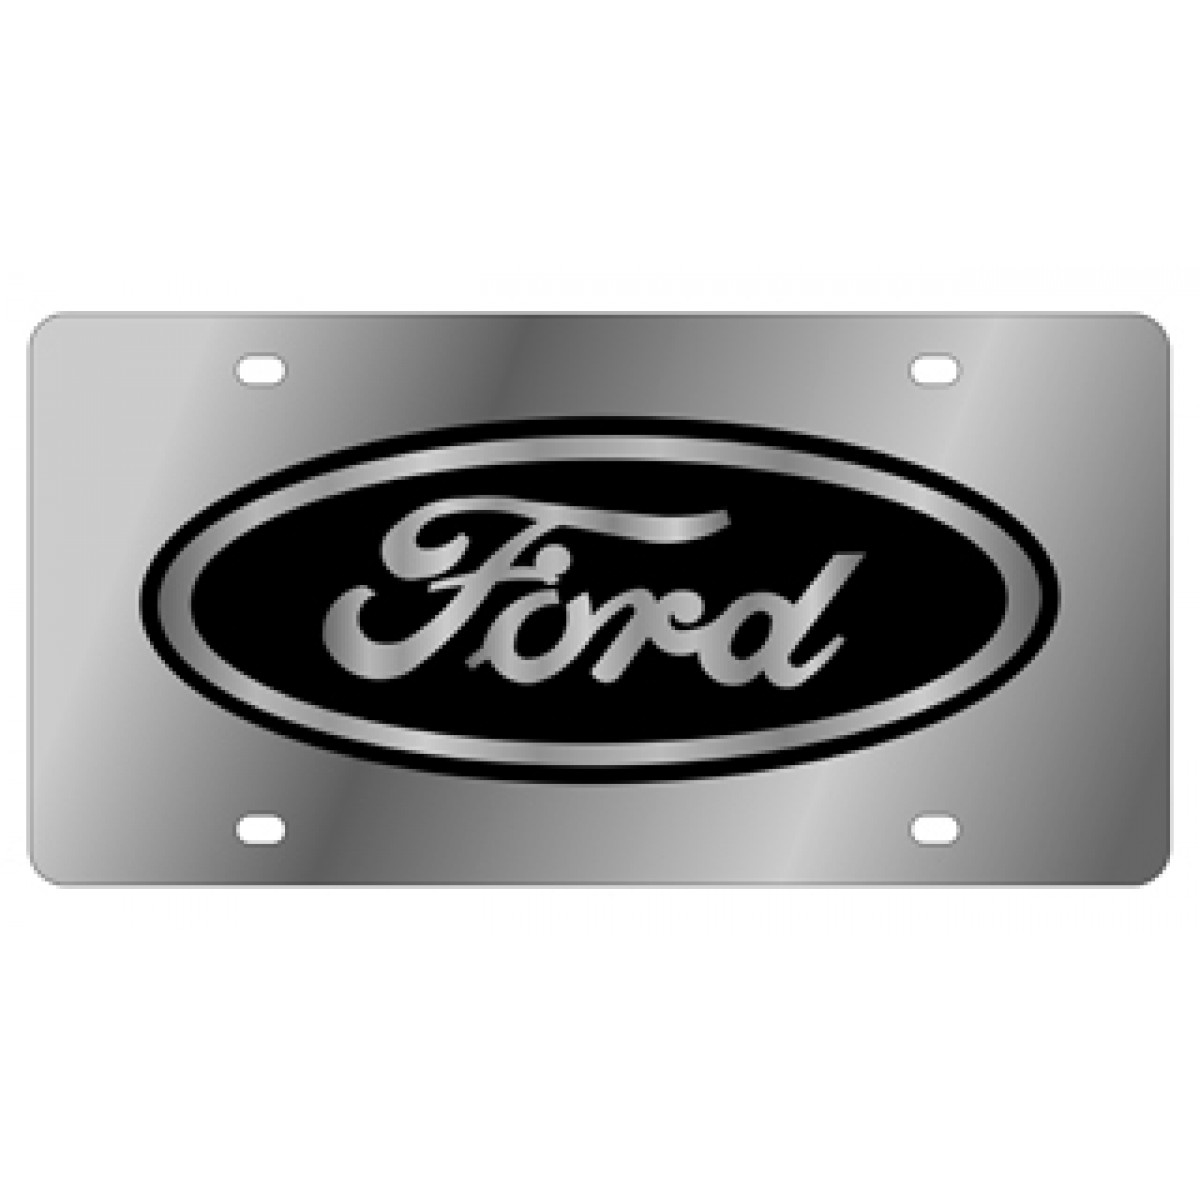 Ford Motor Company's Marketing Mix (4Ps) Analysis